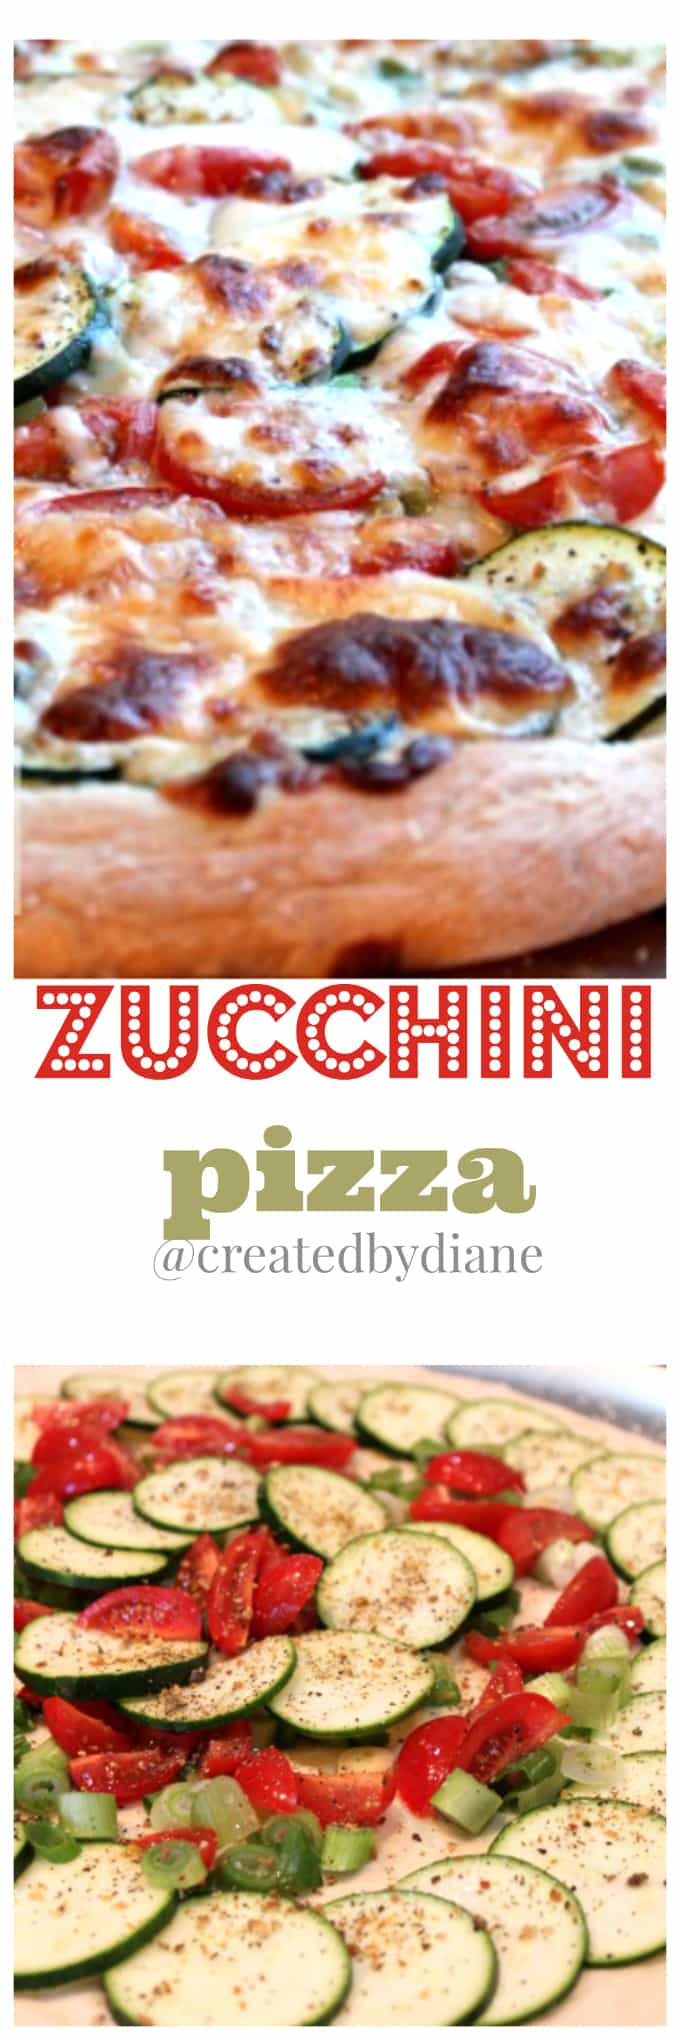 zucchini pizza @createdbydiane